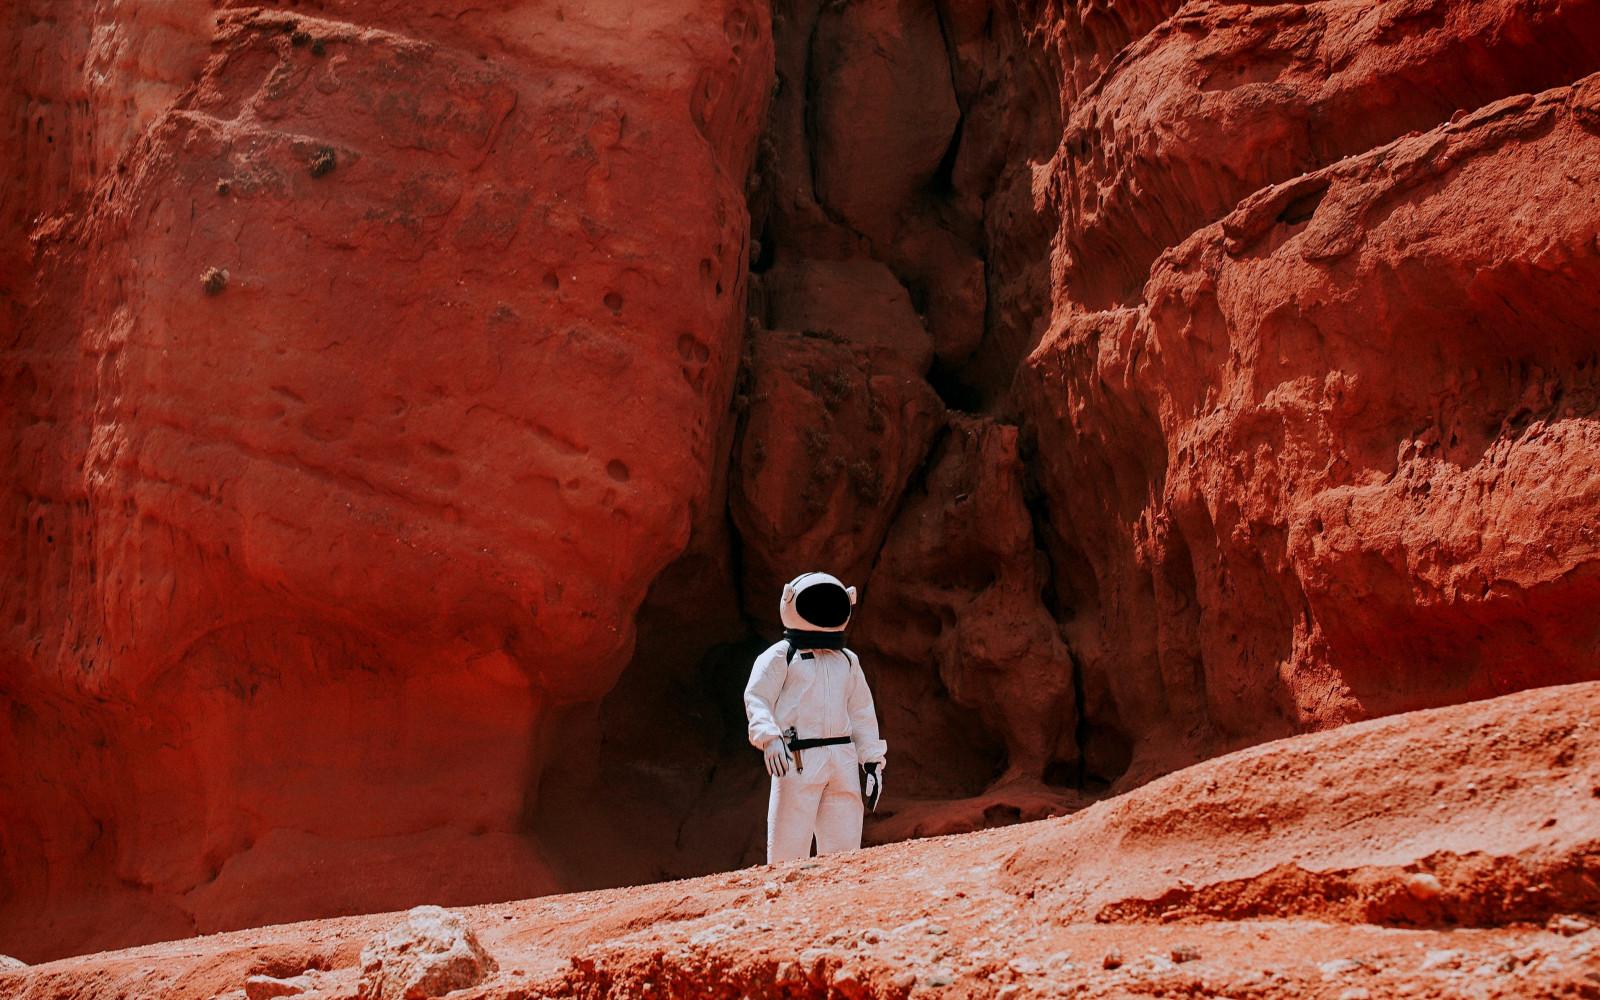 La spiruline sur Mars ? (crédit photo Nicolas Lobos @Unsplash)